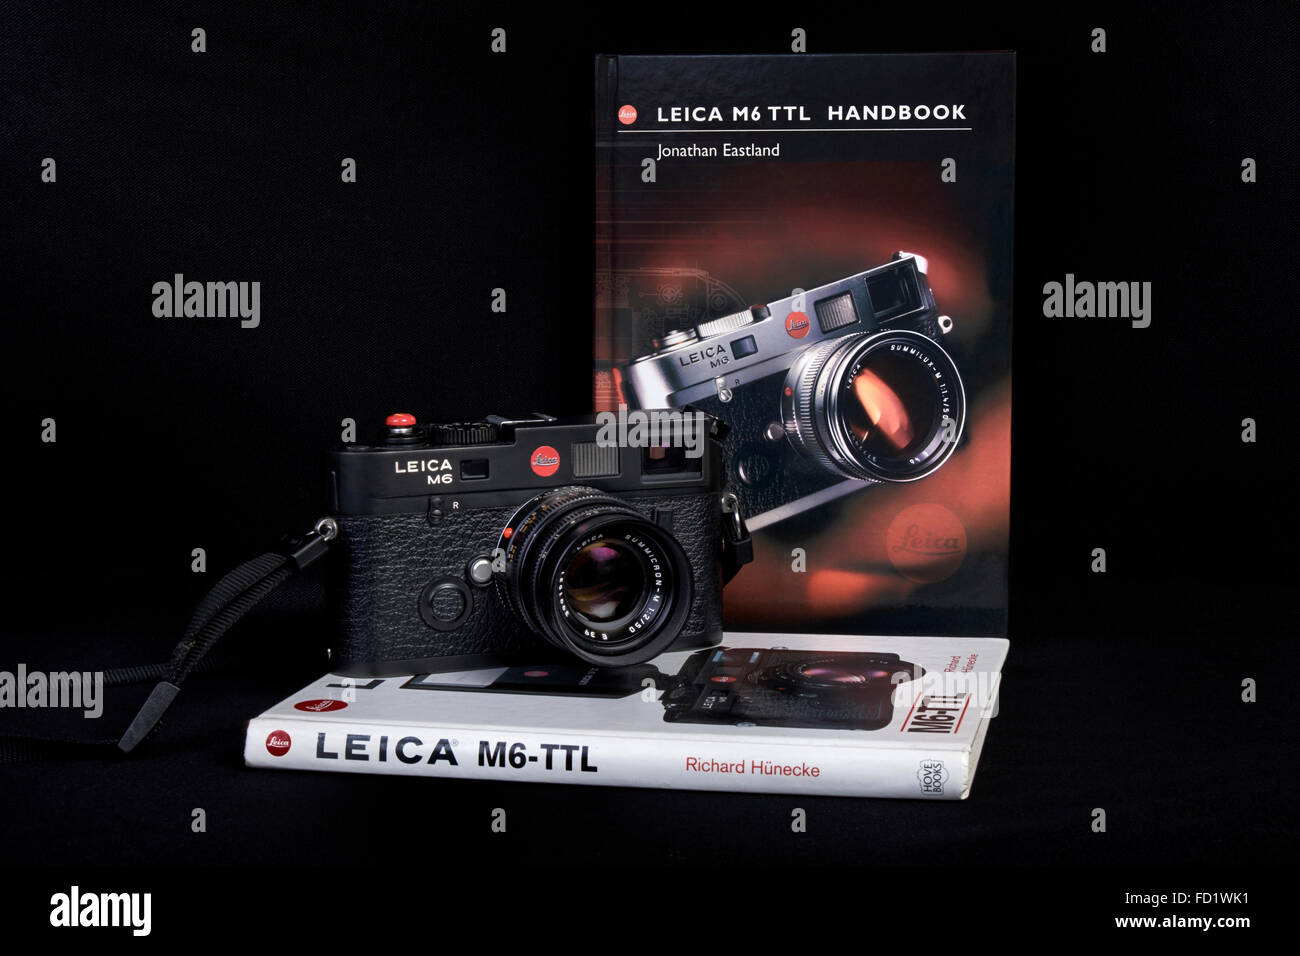 Leica M6 TTL classic 35mm vintage rangefinder film camera and handbooks. Stock Photo